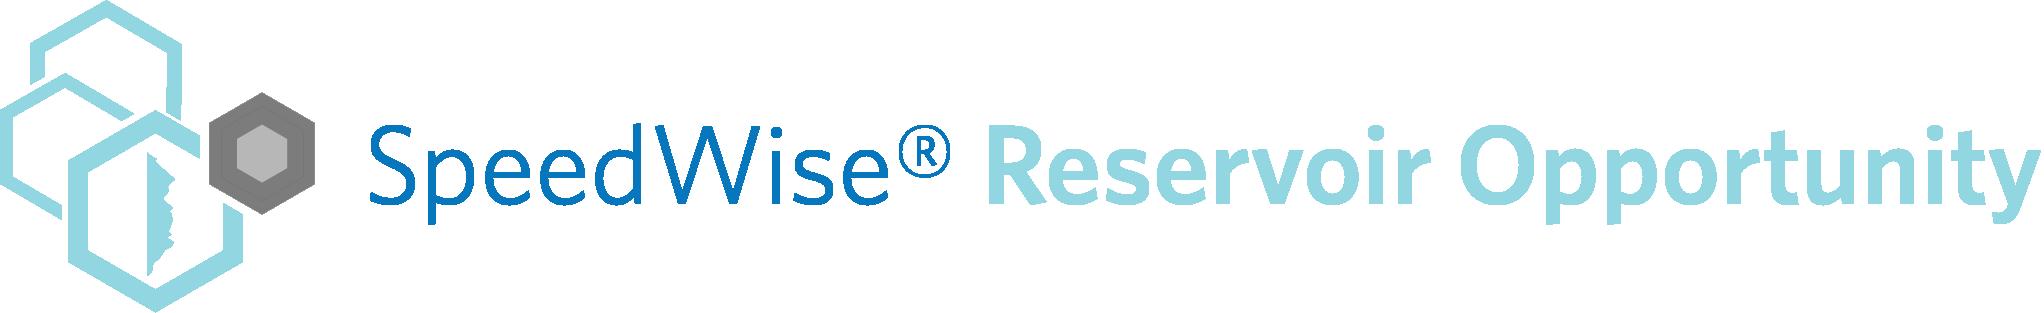 SRO - SpeedWise Reservoir Opportunity